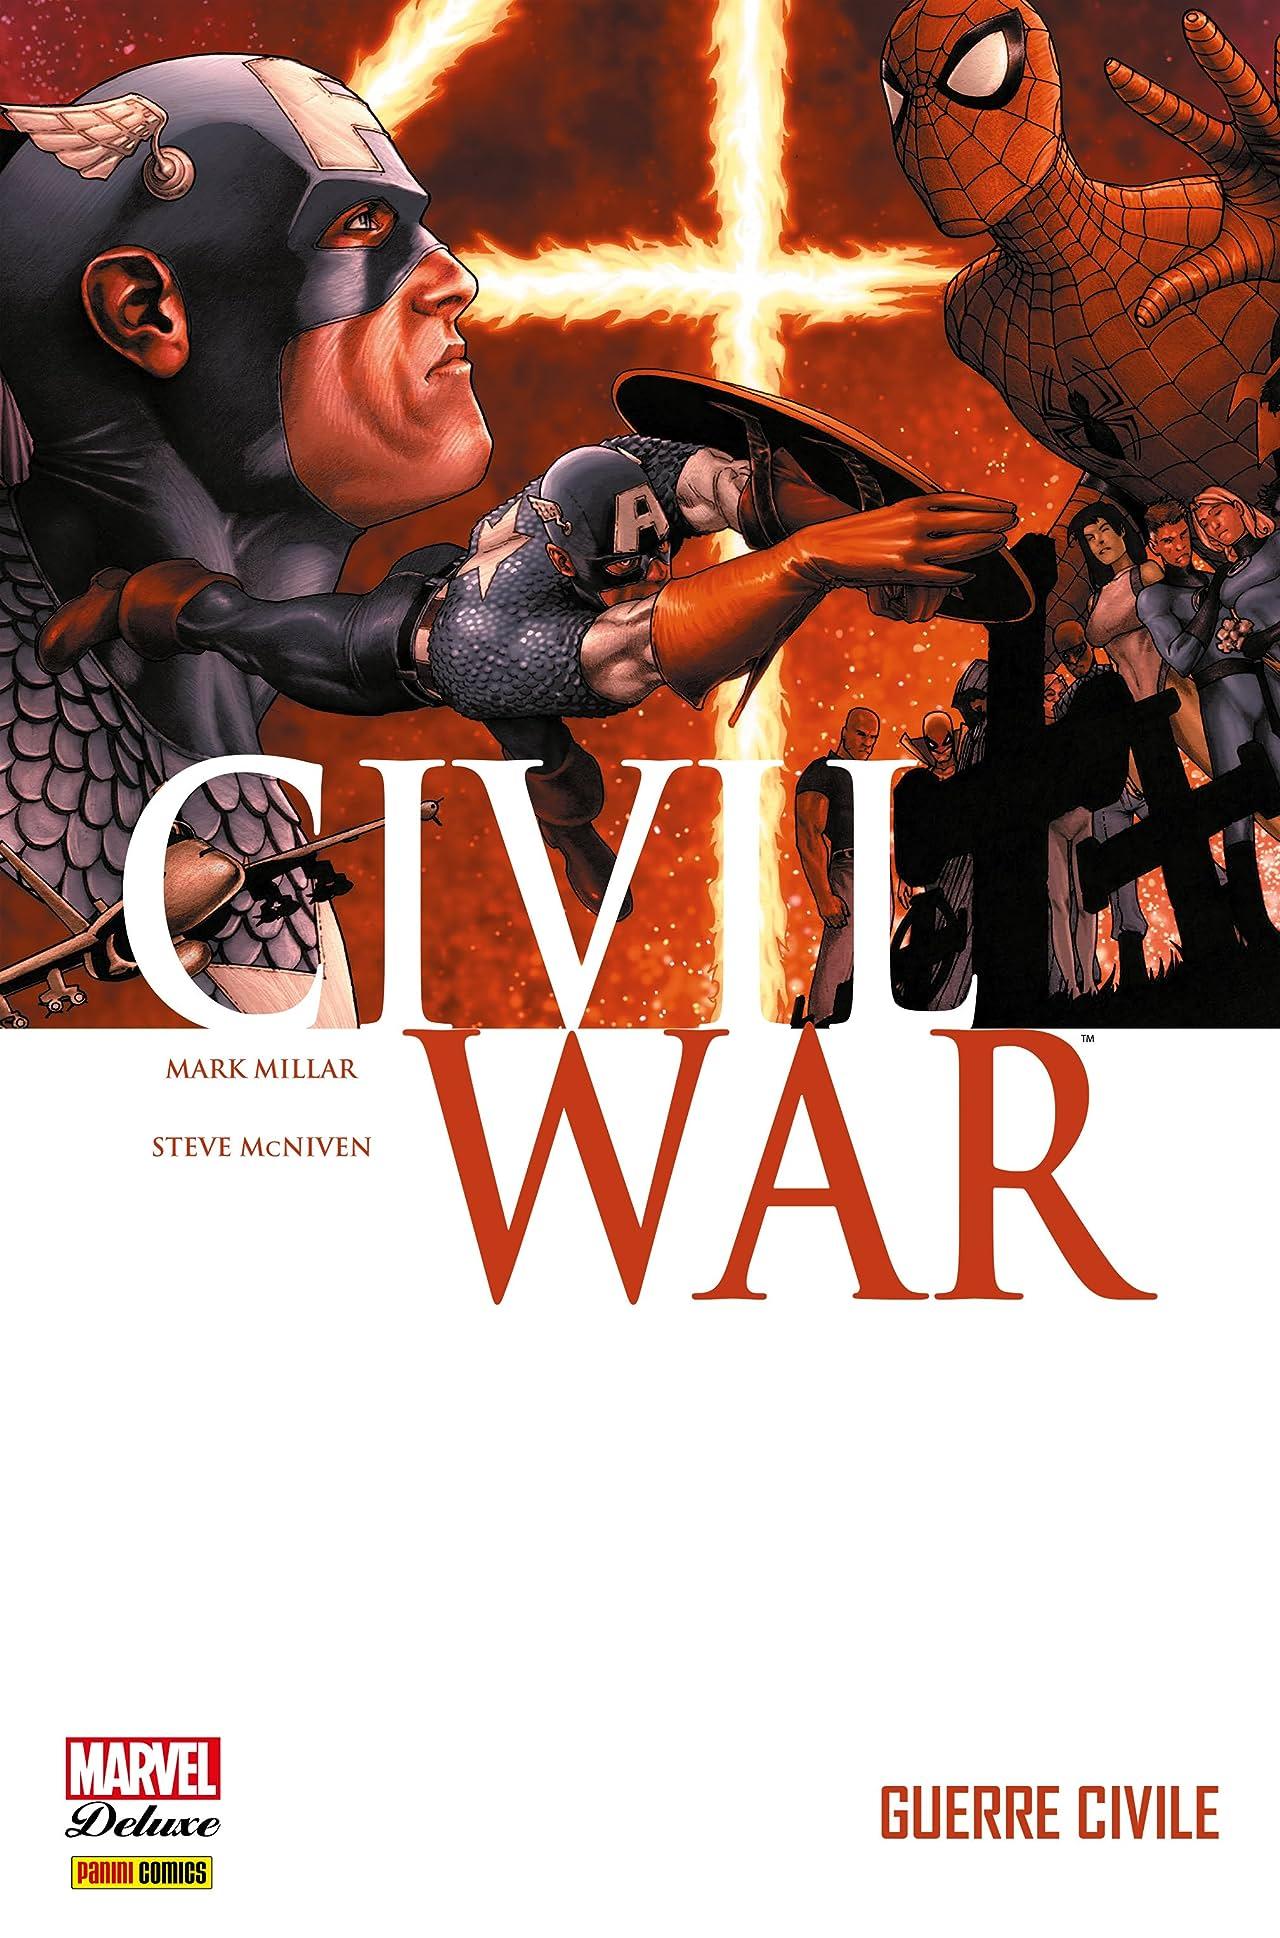 Civil War Vol. 1: Guerre Civile